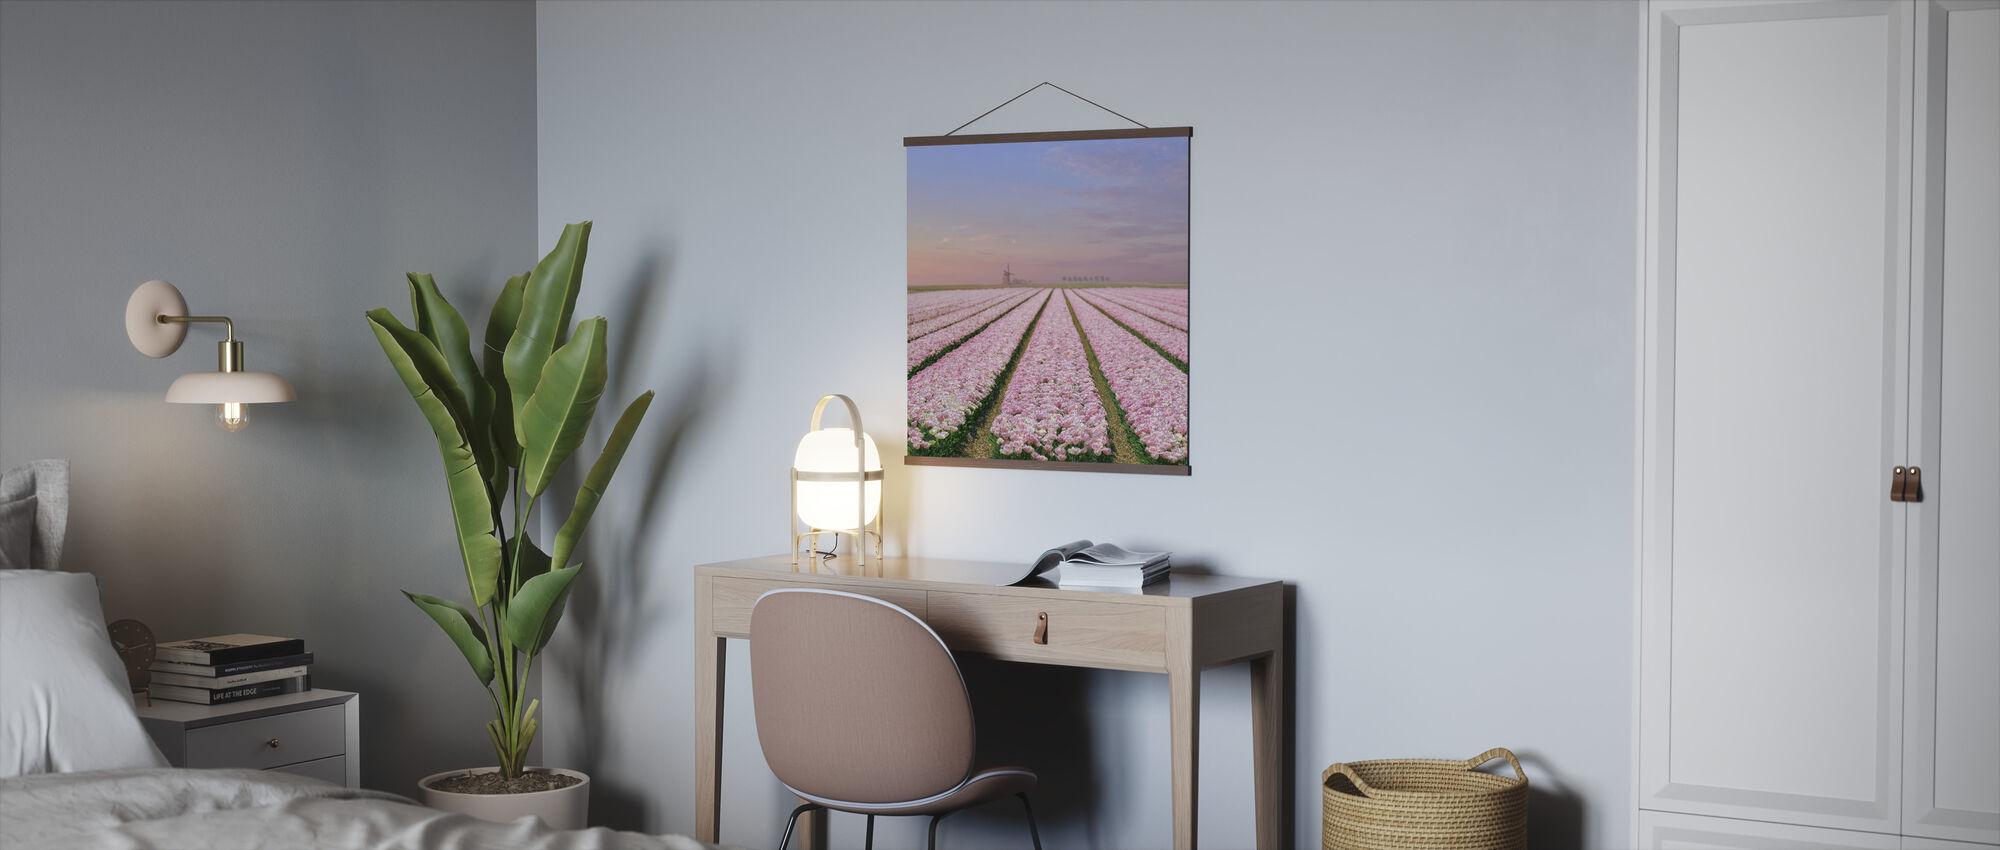 Tulip Fields - Poster - Office